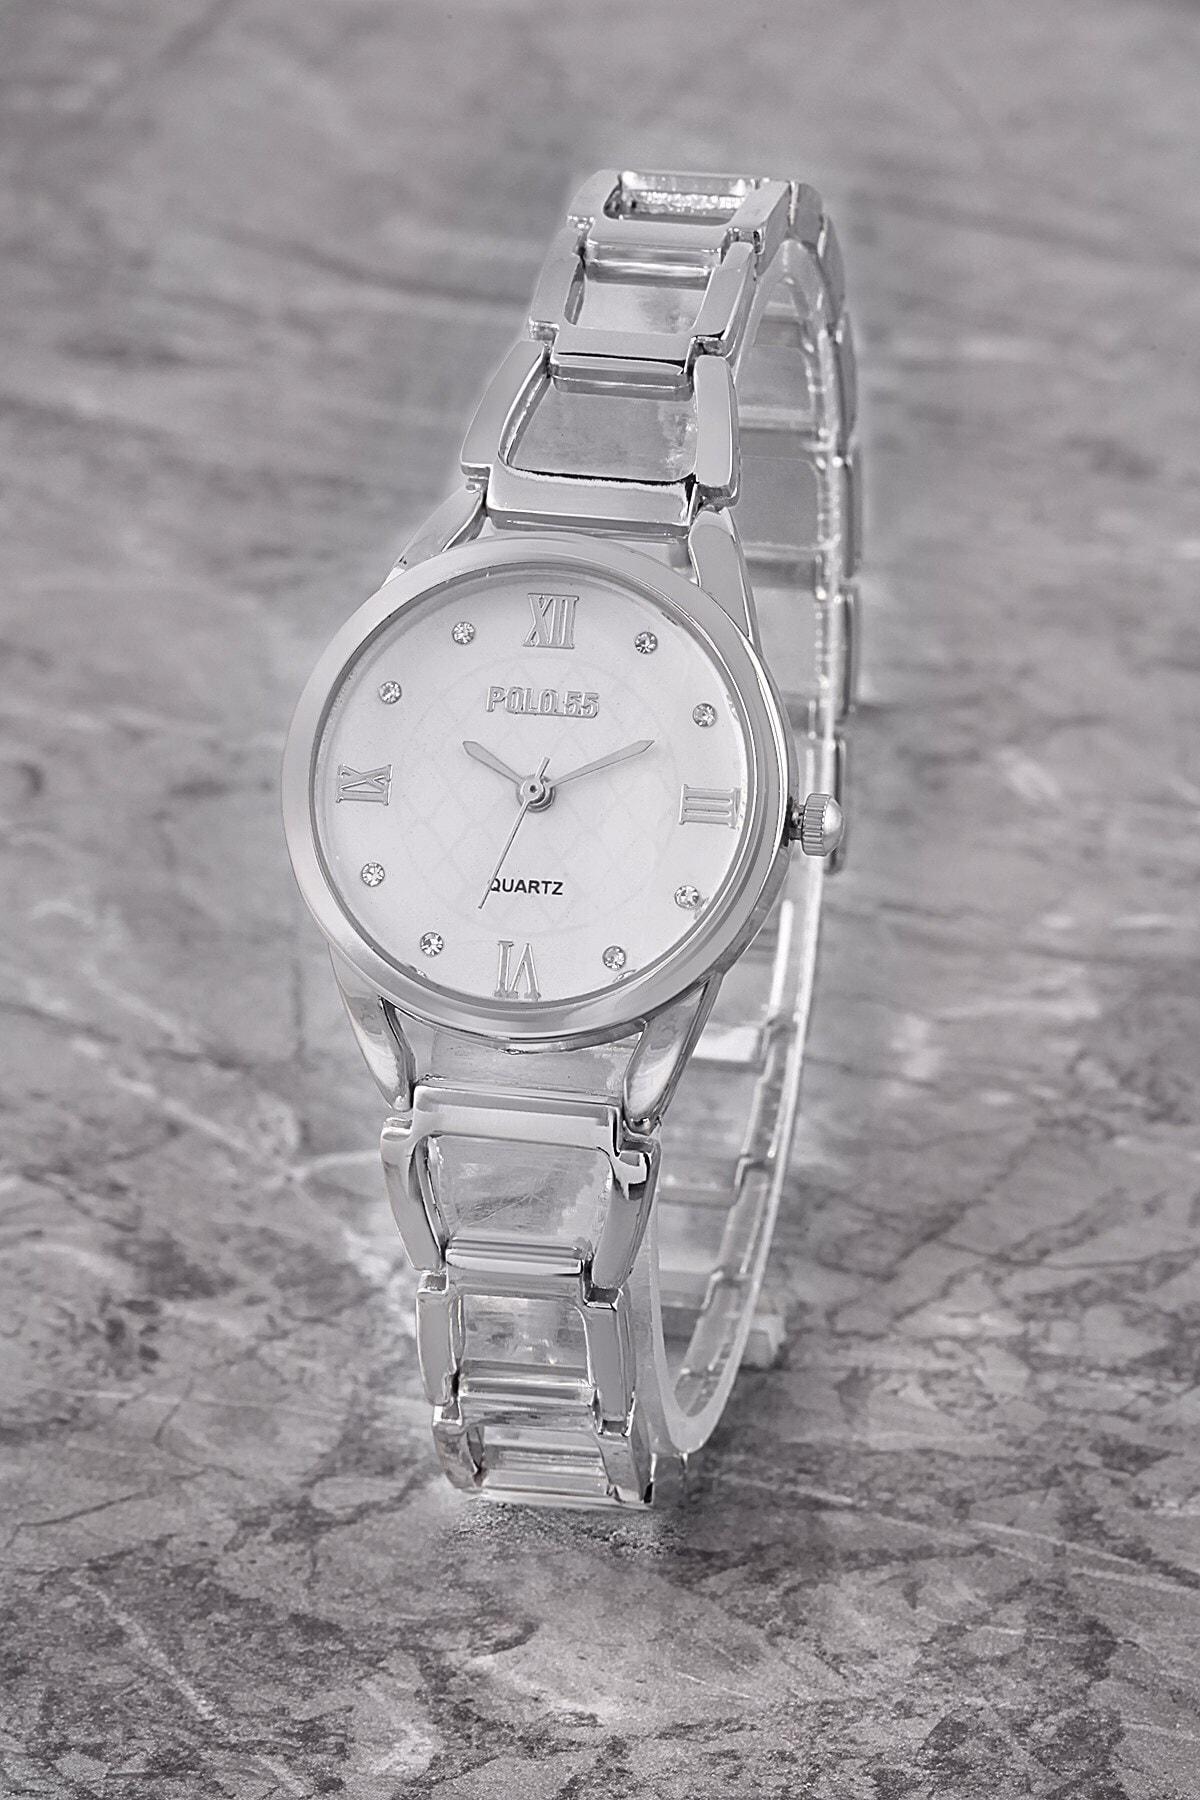 Polo55 Plkm001r04 Romen Rakamlı Taşlı Kadran,kadın Gümüş Kol Saati 1